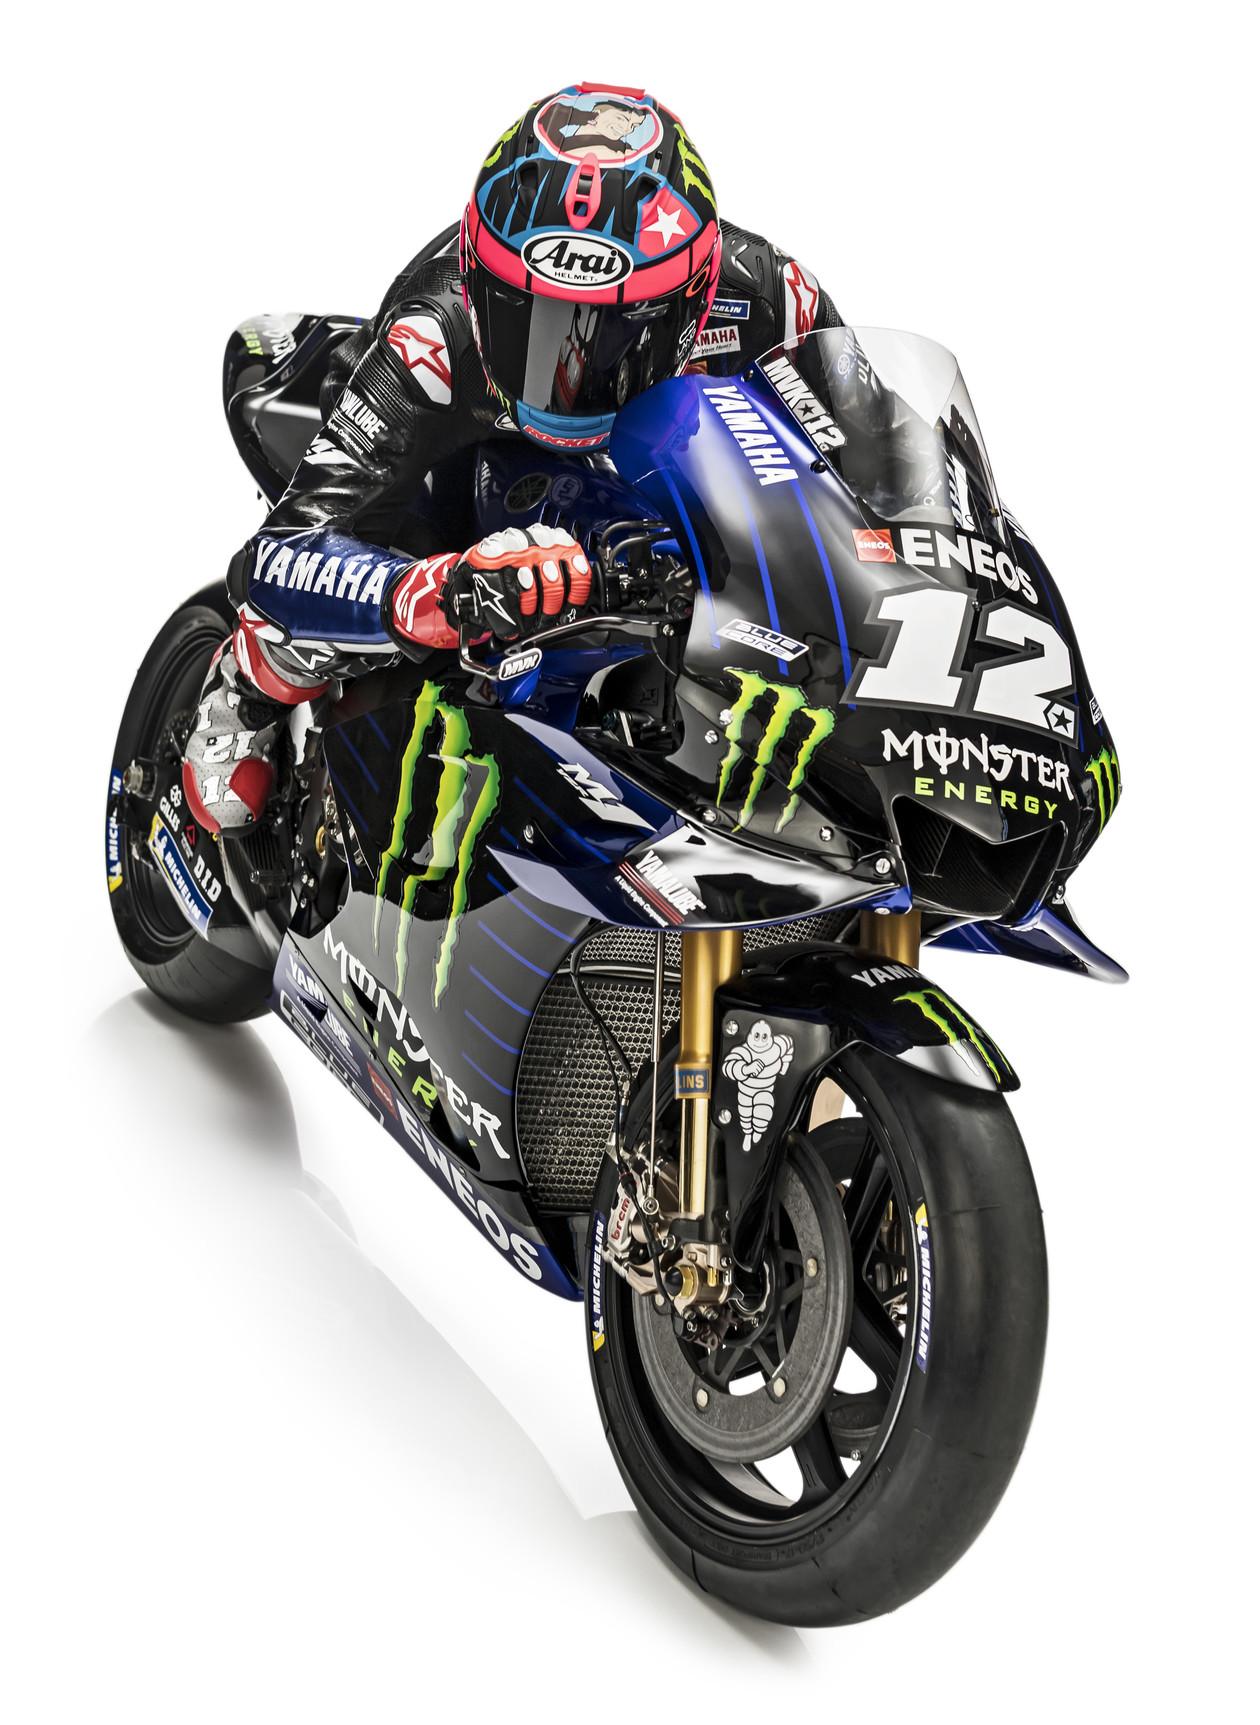 Monster Energy Yamaha MotoGP 2019